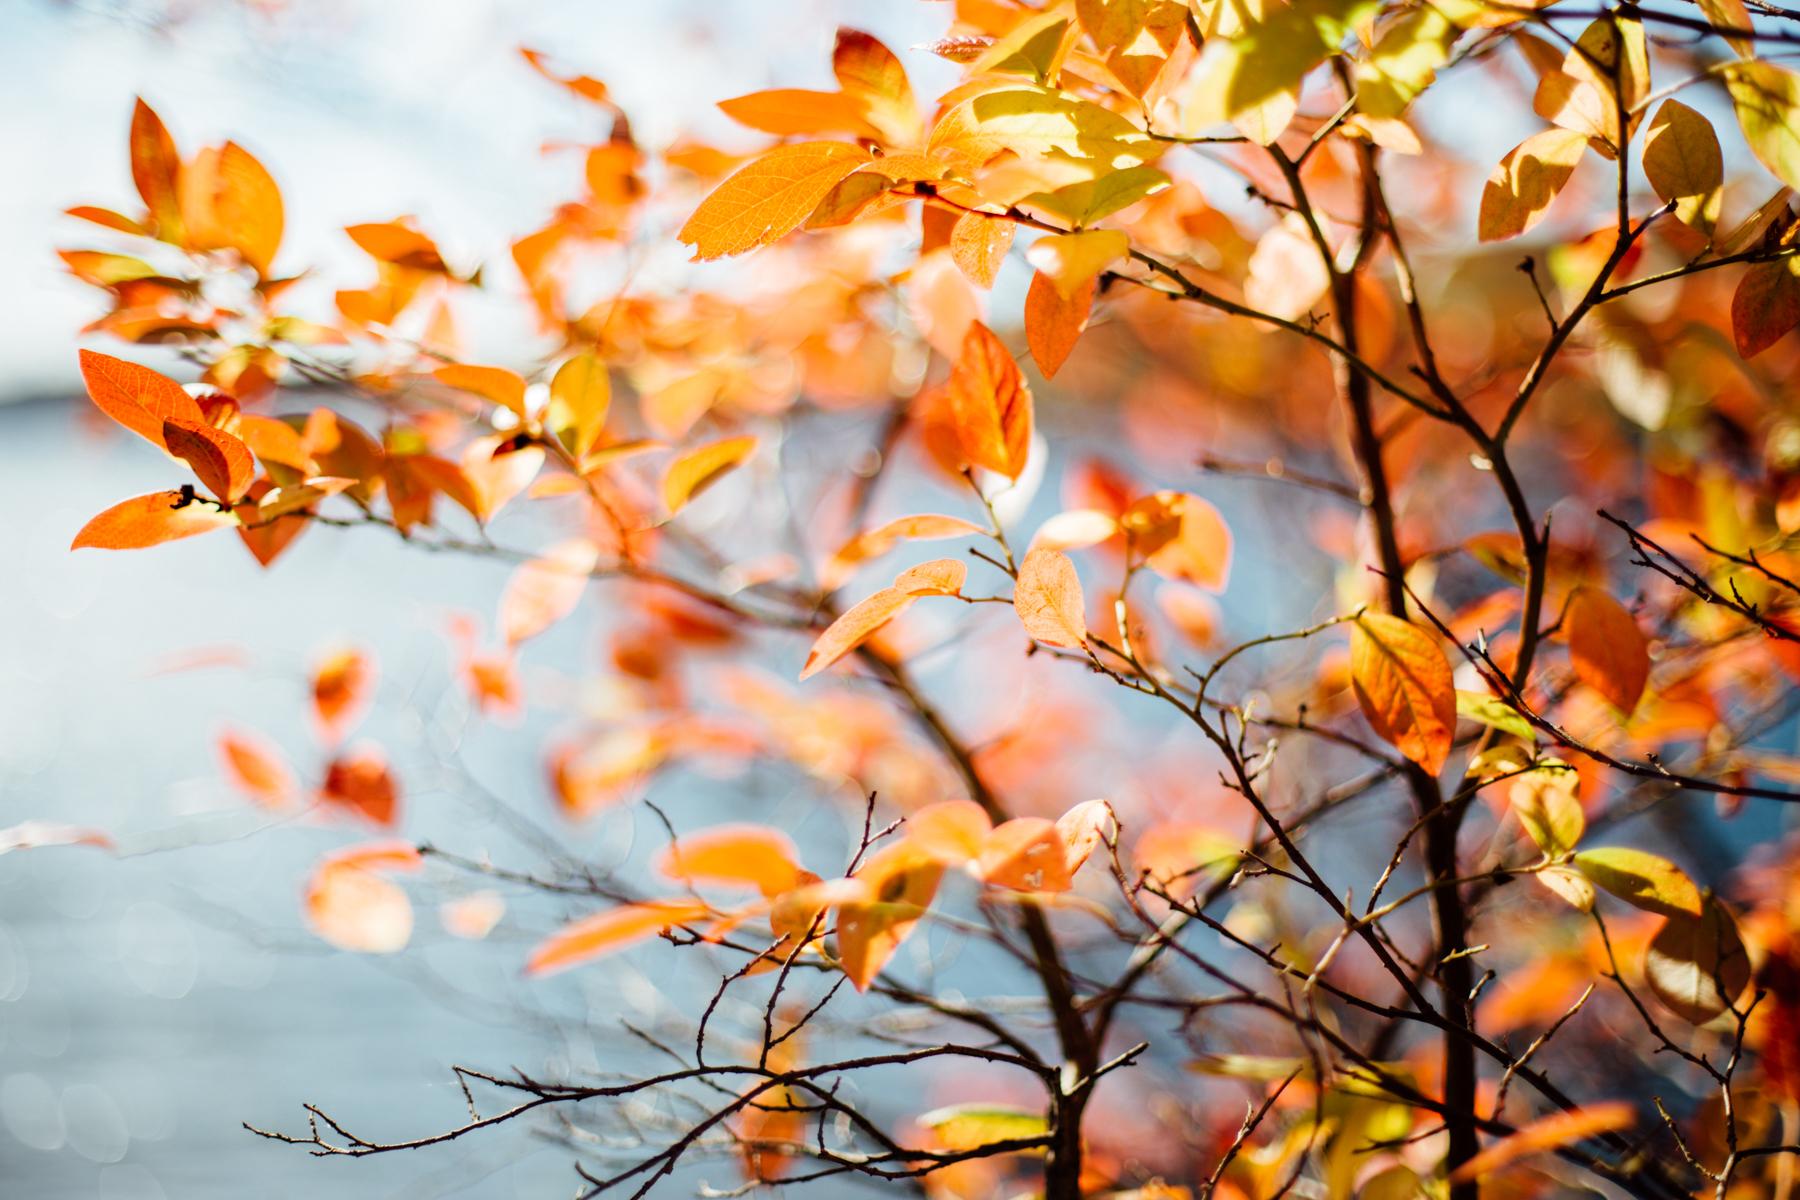 harriman-state-park-fall-9174.jpg